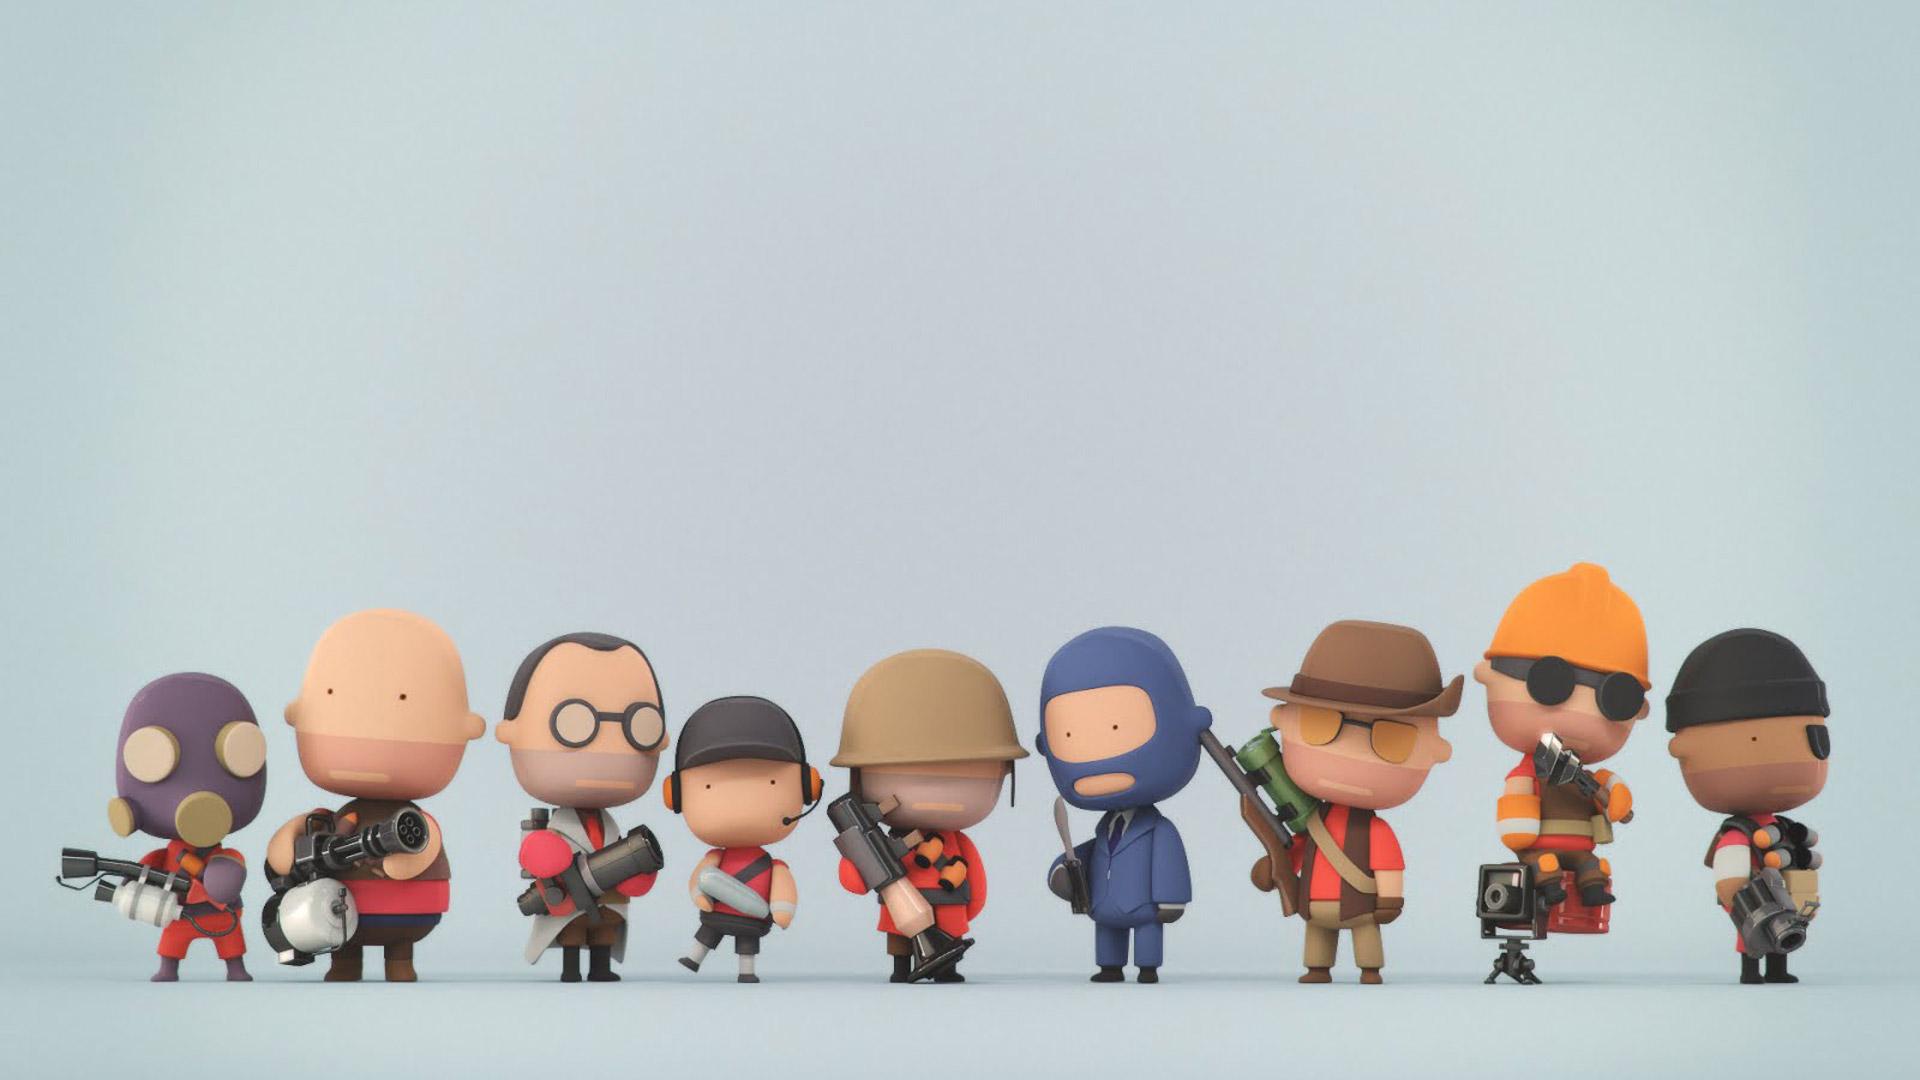 Team Fortress 2 wallpaper 3